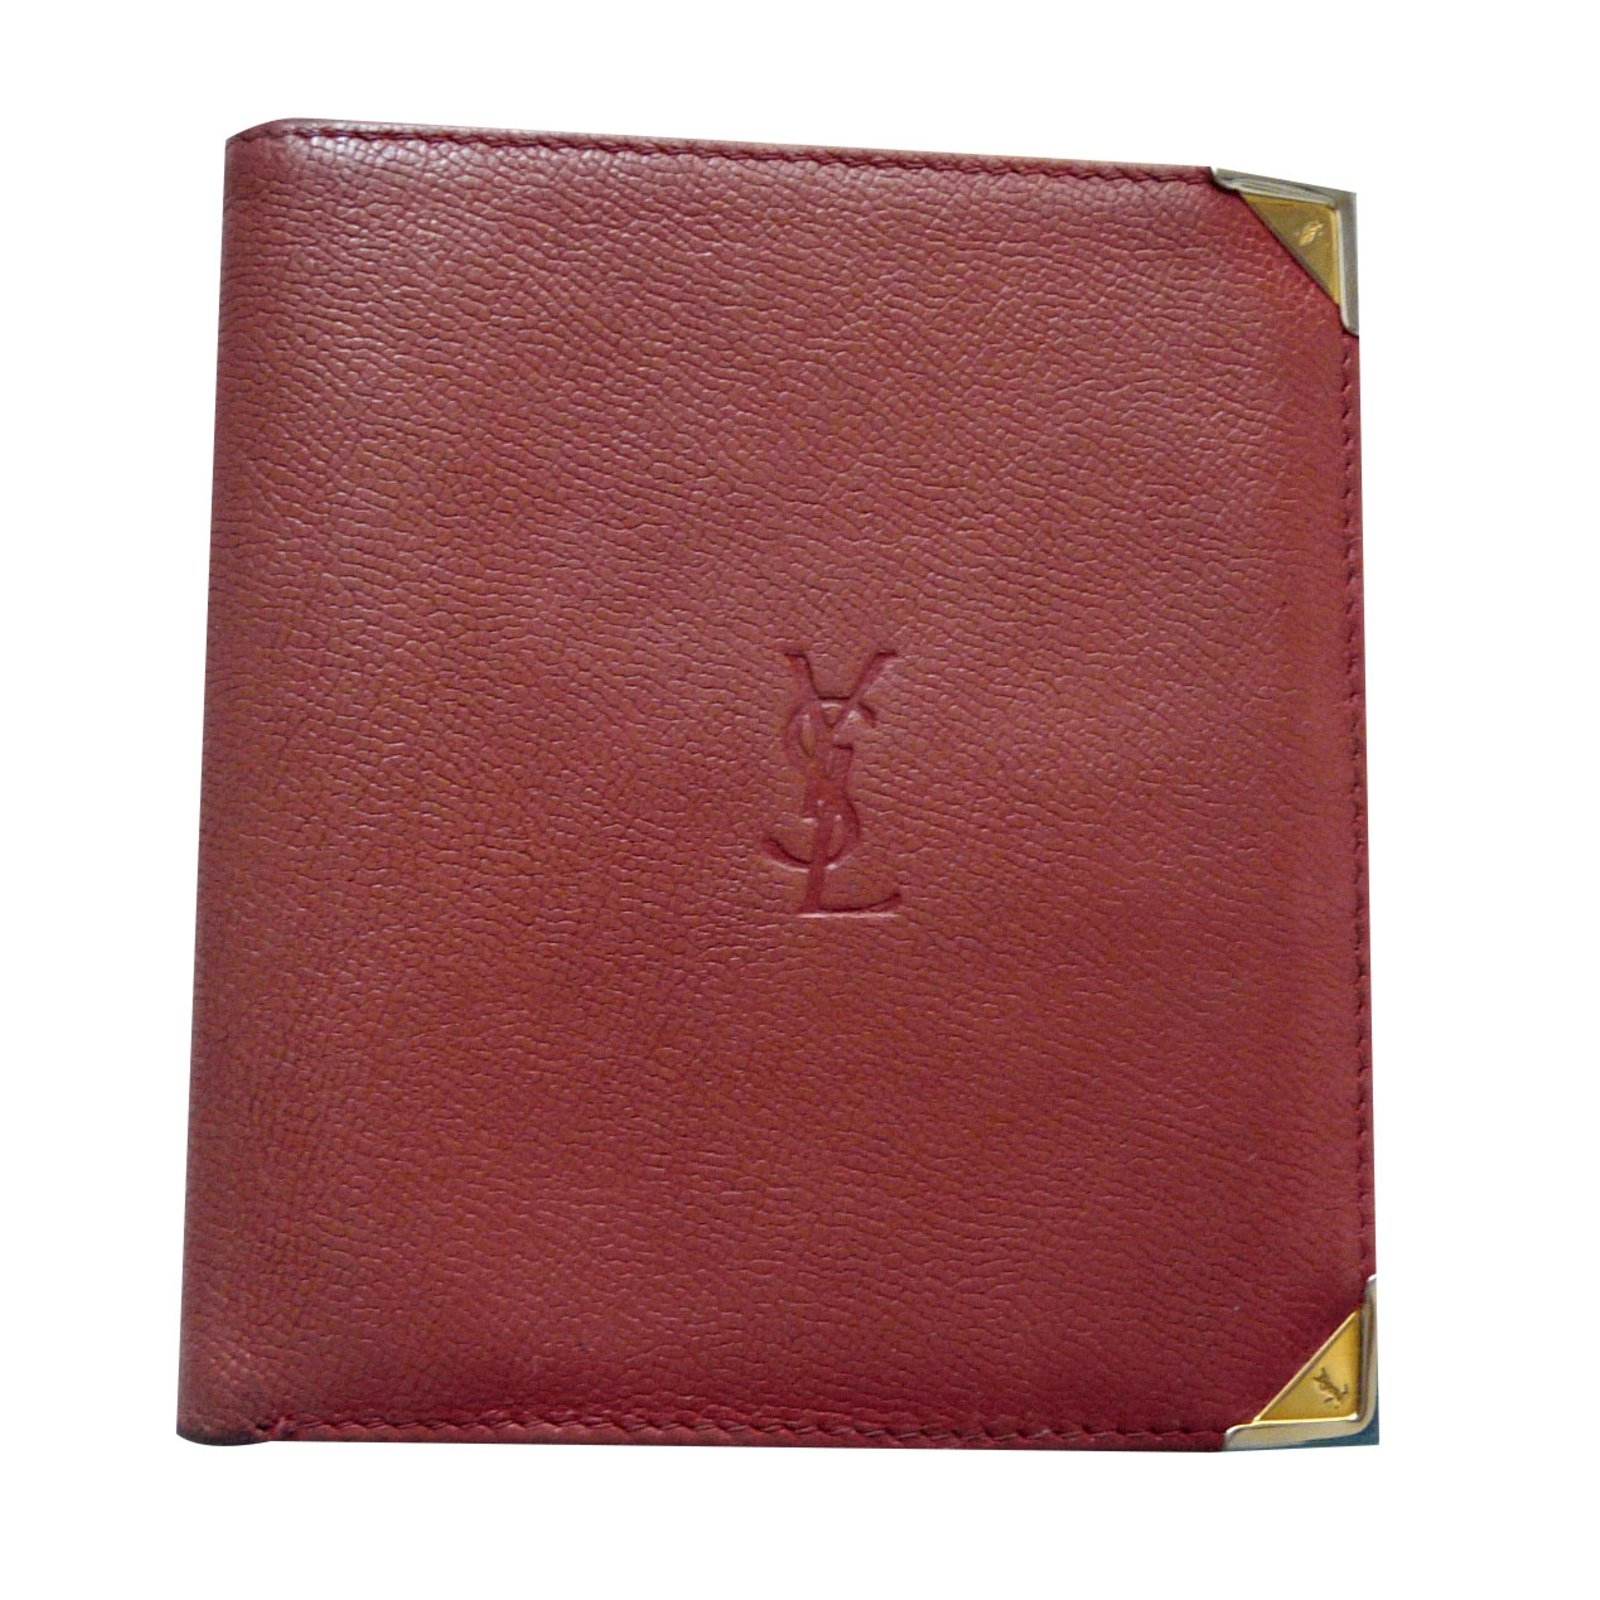 4189f1605c0 Yves Saint Laurent Vintage wallet Wallets Leather Red ref.68975 ...